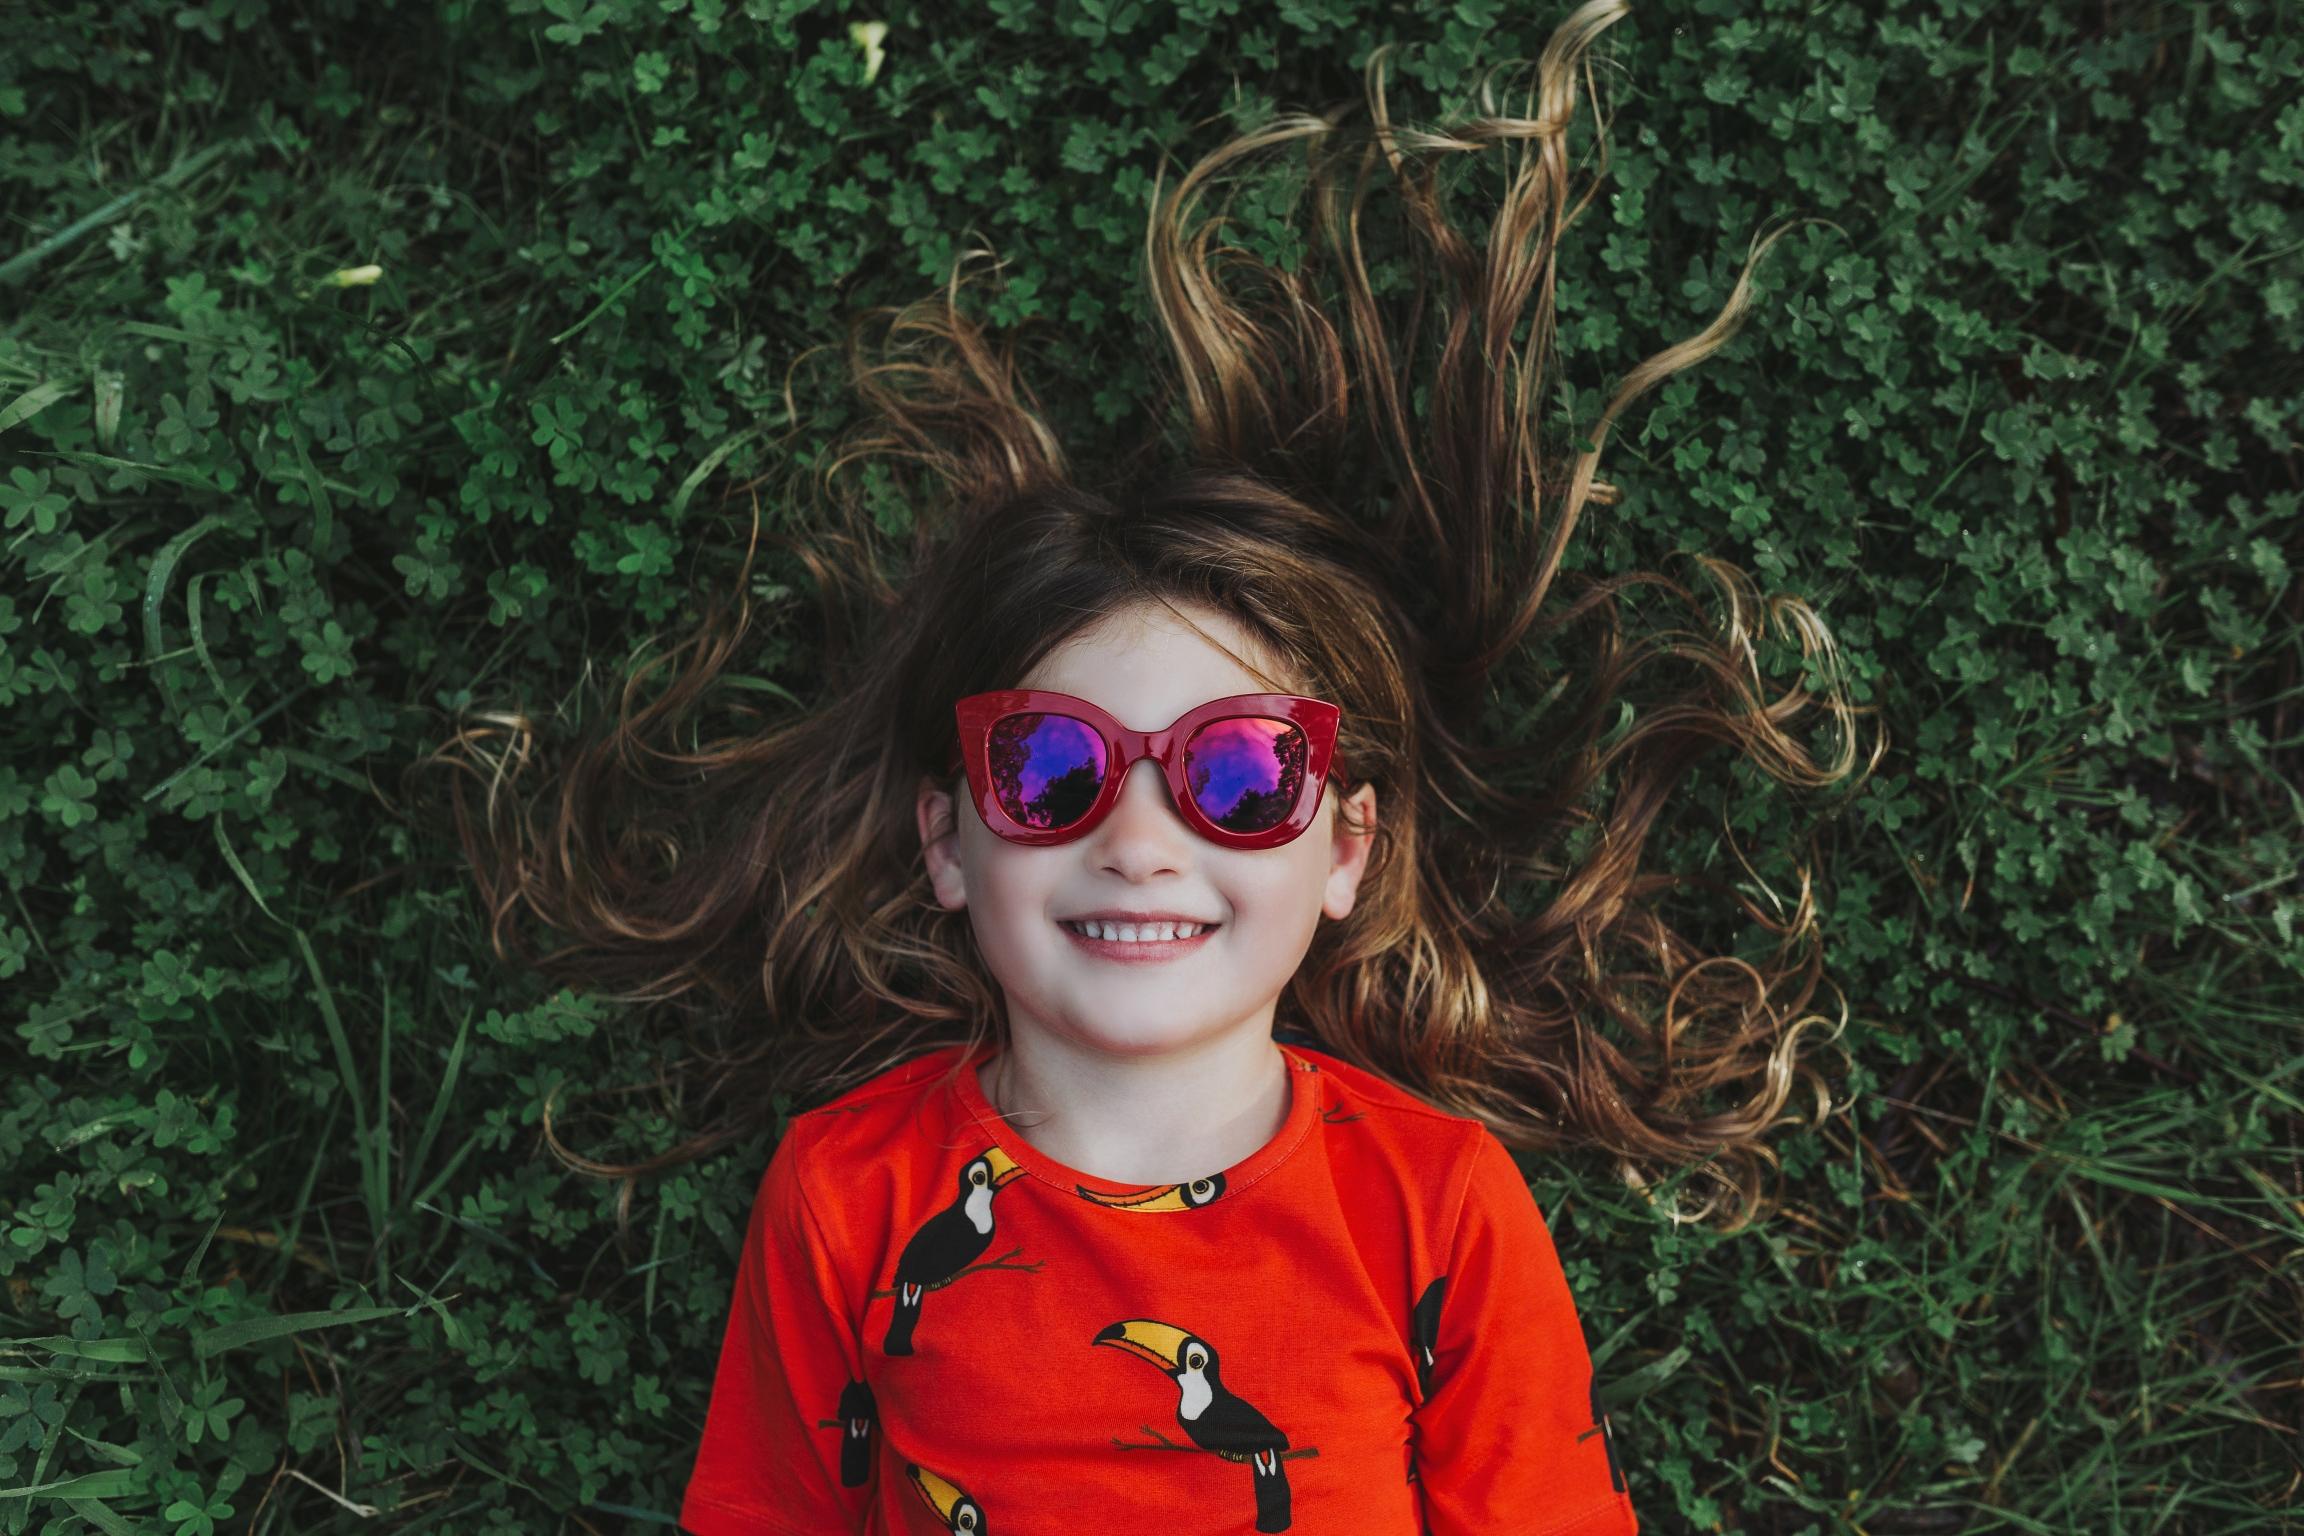 girl-smiles-sunglasses-fashion-photography-siida-tasmania.jpg